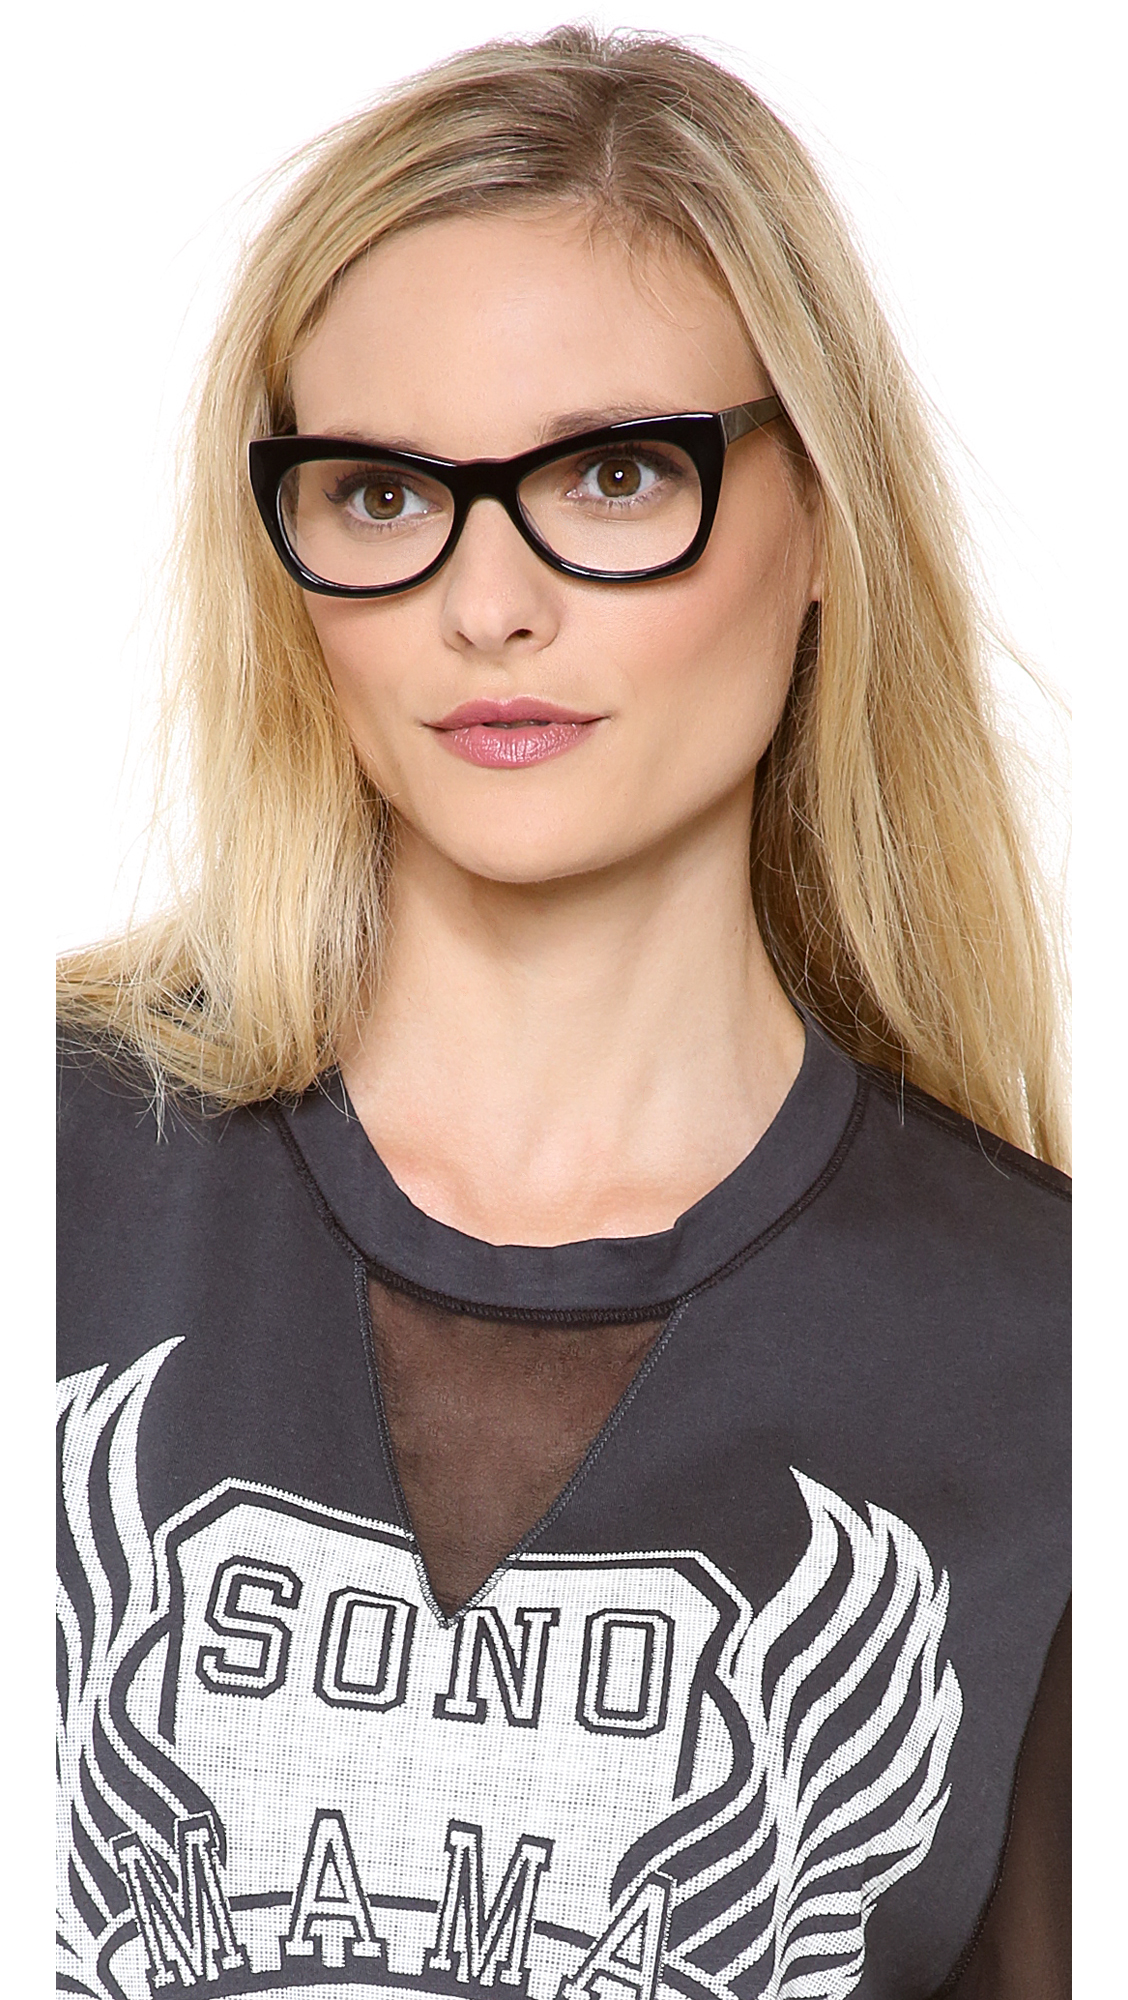 2f618e5488 Elizabeth and james centinela glasses shopbop jpg 1128x2000 Elizabeth james  eyewear